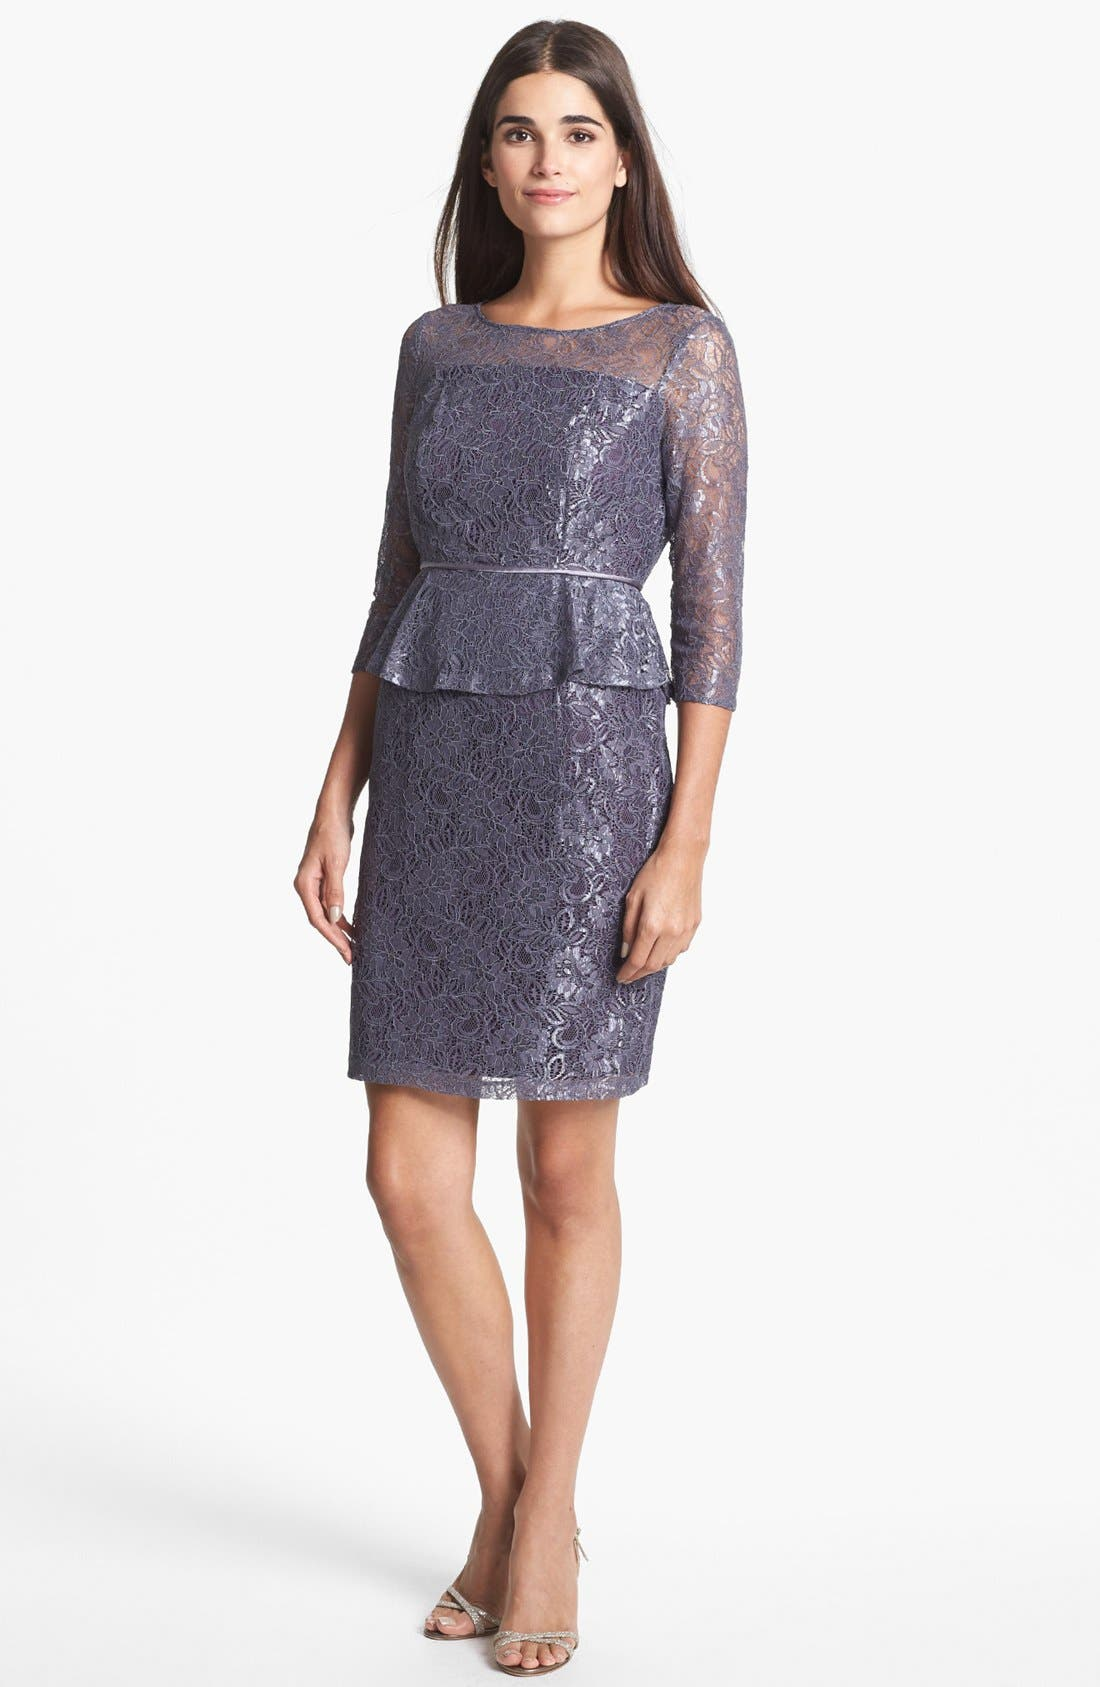 Alternate Image 1 Selected - Adrianna Papell Lace Peplum Sheath Dress (Petite)